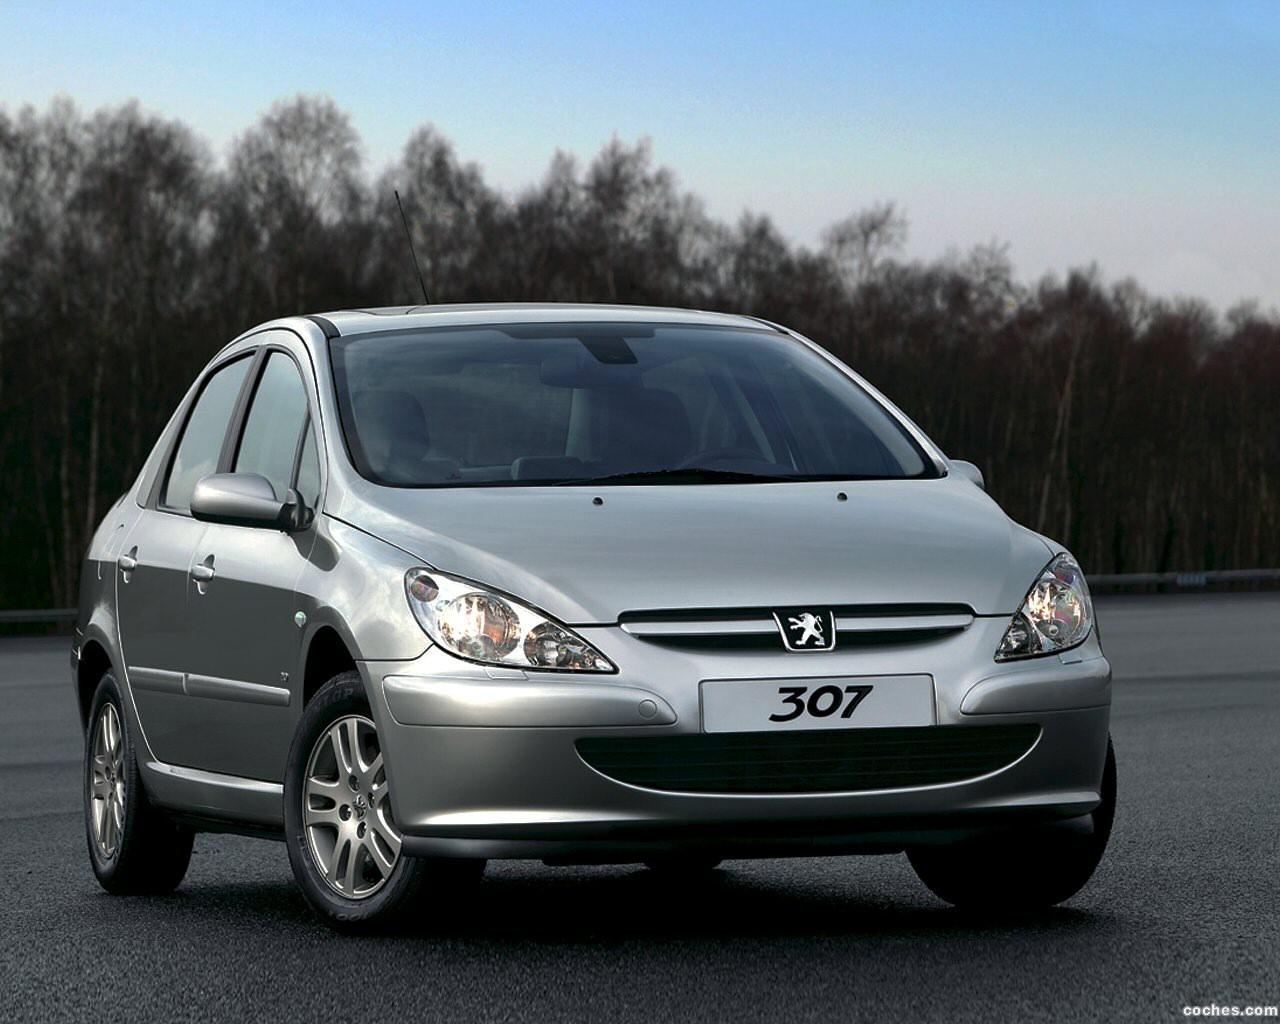 Foto 0 de Peugeot 307 Sedan 2004